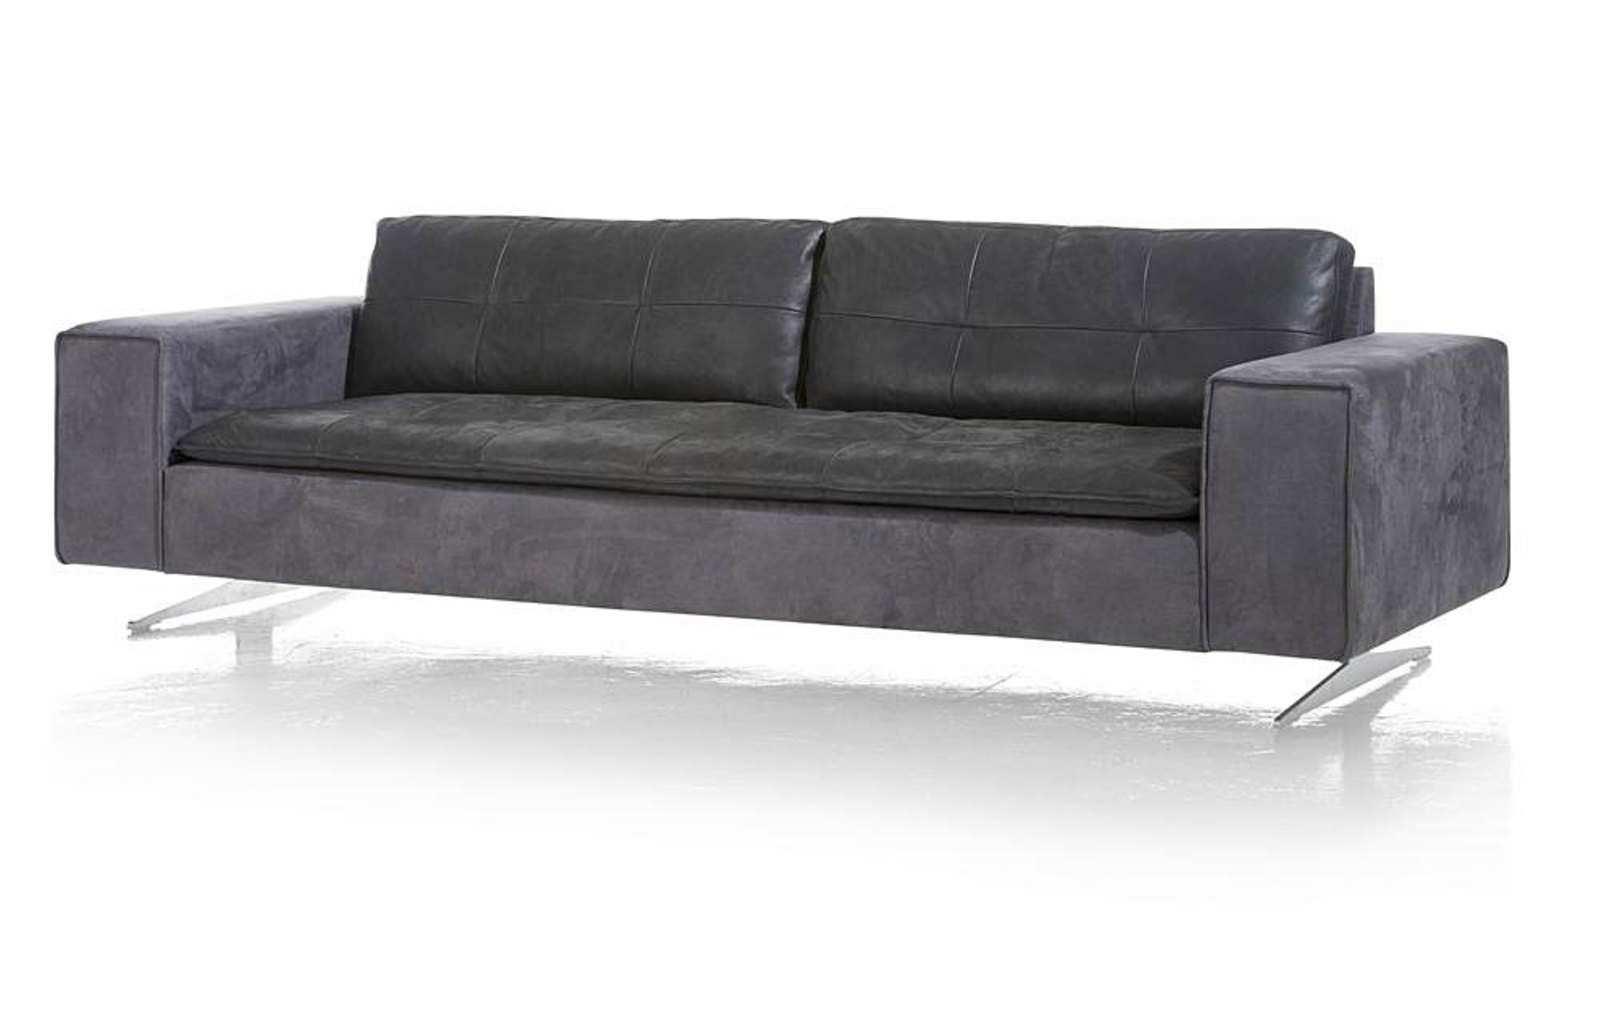 gunstige sofa kaufen 60 with burostuhl gunstige g c3 bcnstige 55 design von gunstig sofa kaufen of gunstig sofa kaufen